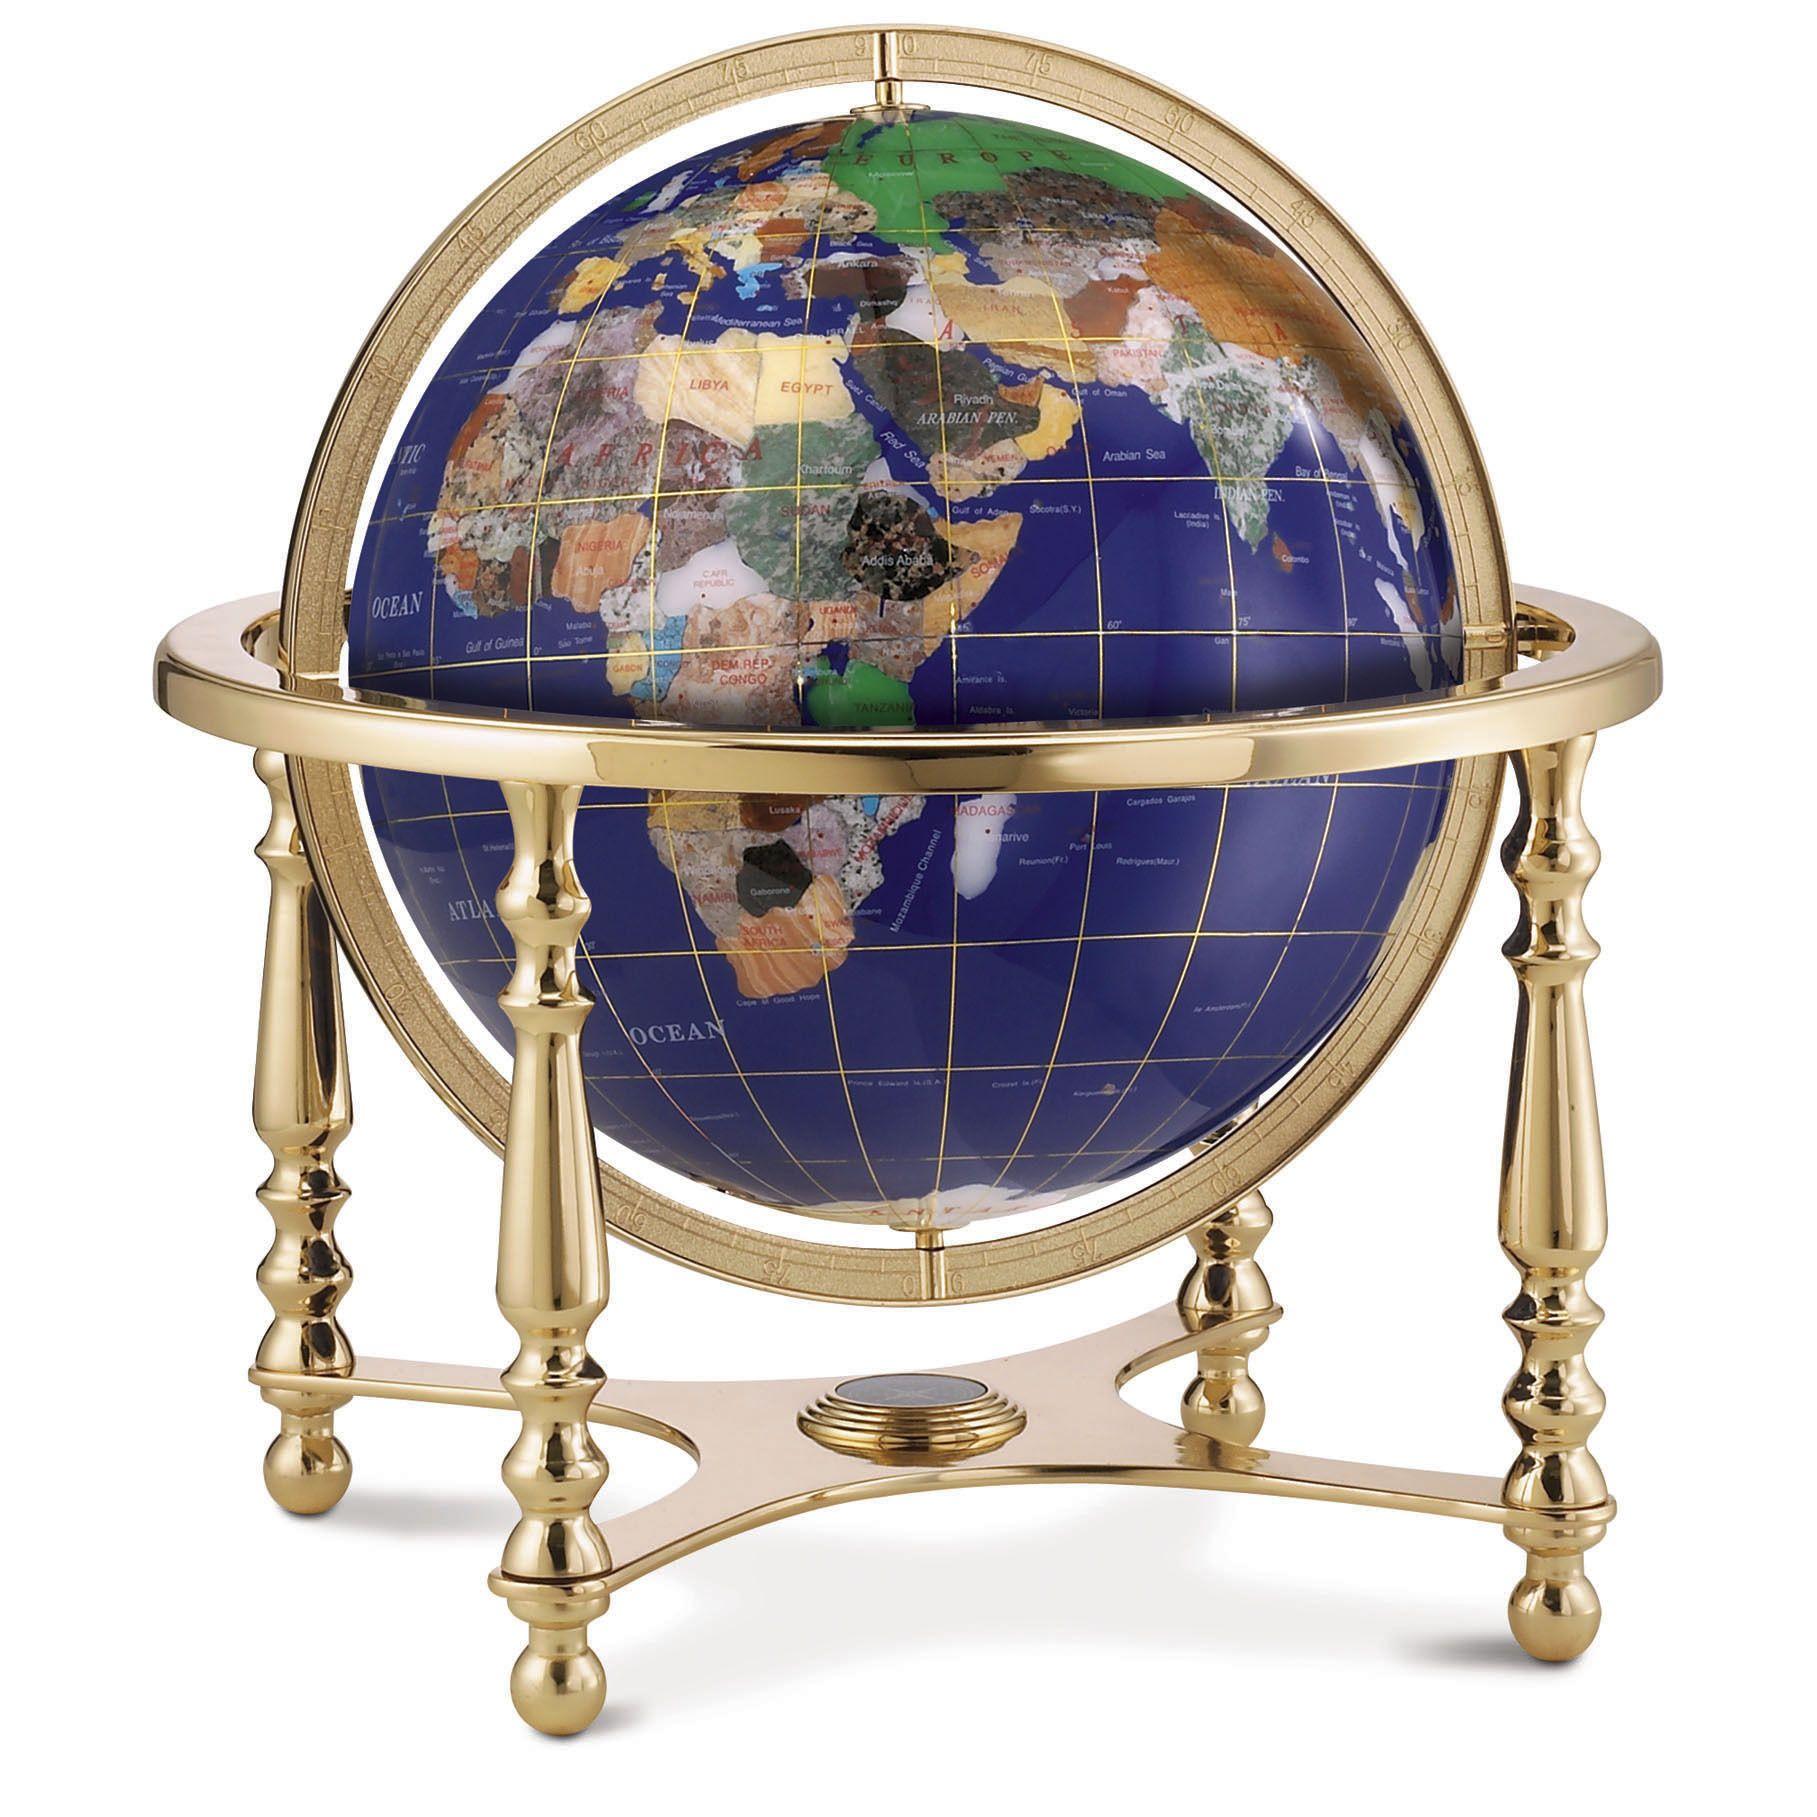 The exquisite desktop gemstone globe has a blue lapis ocean and is replogle compass jewel desktop world globe 13 inch diameter with semi precious gemstones blue lapis ocean ball gumiabroncs Images